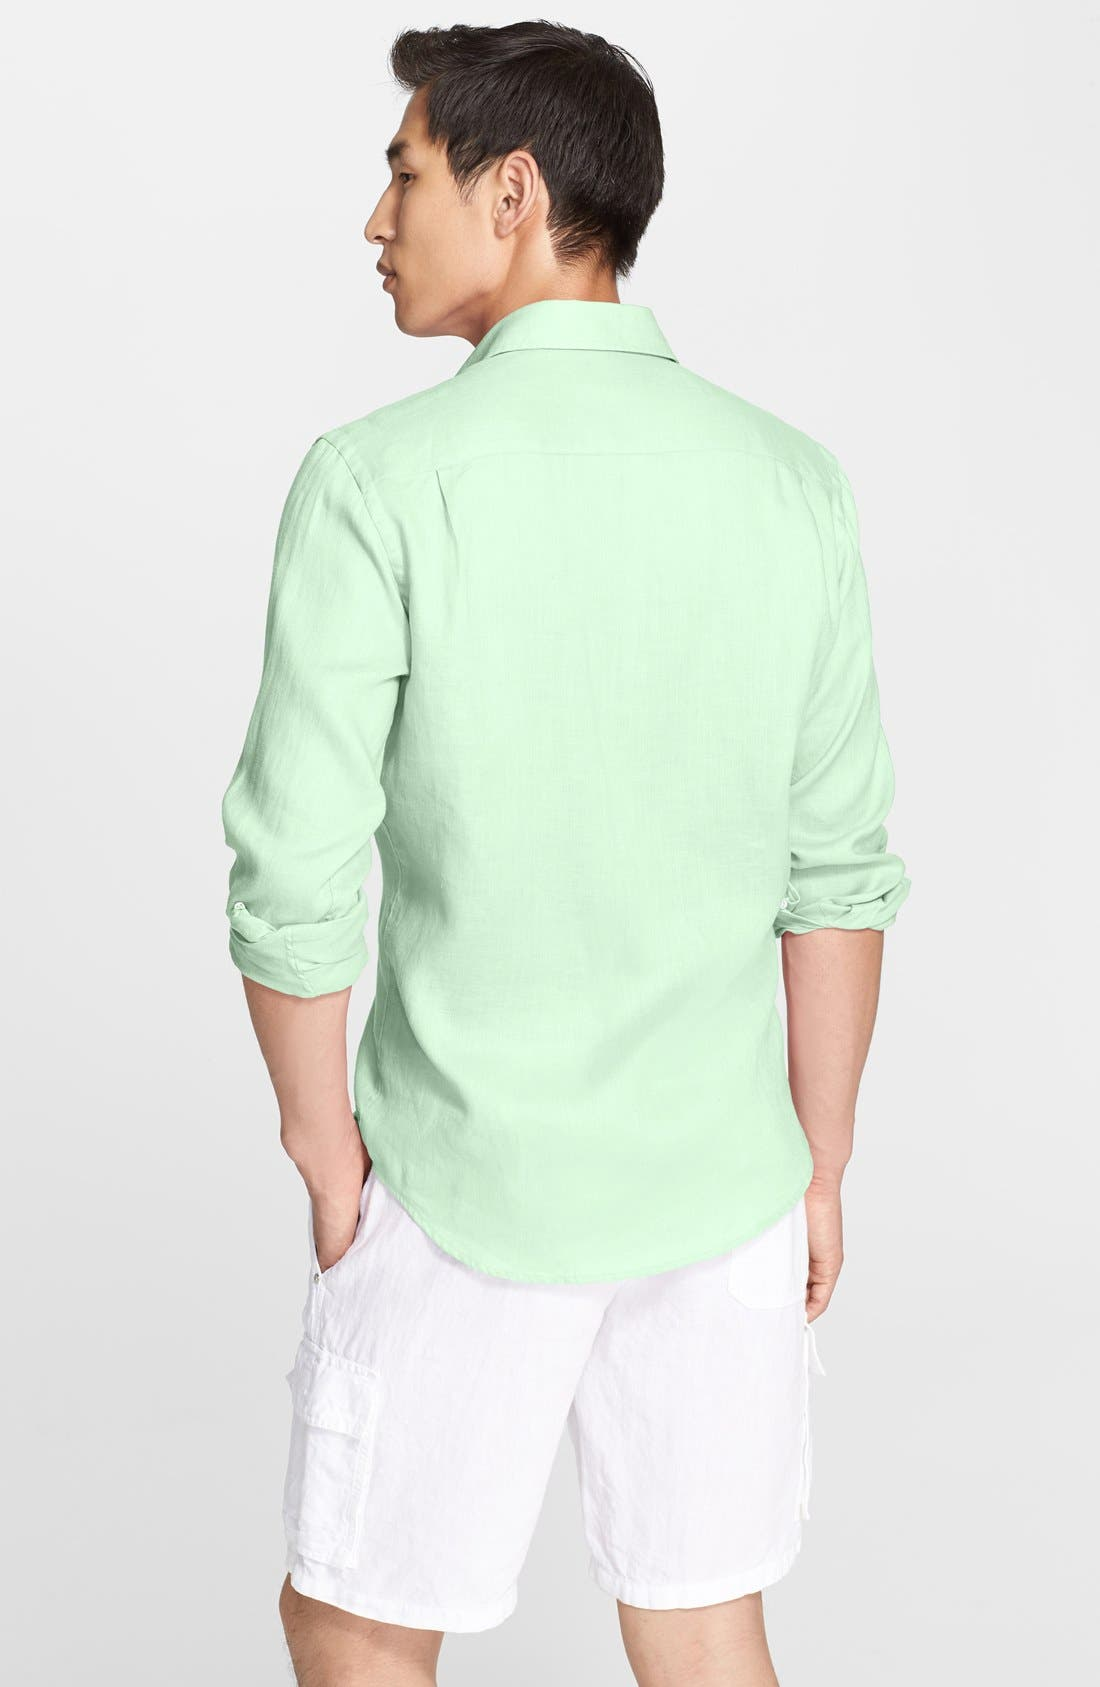 'Caroubier' Linen Shirt,                             Alternate thumbnail 21, color,